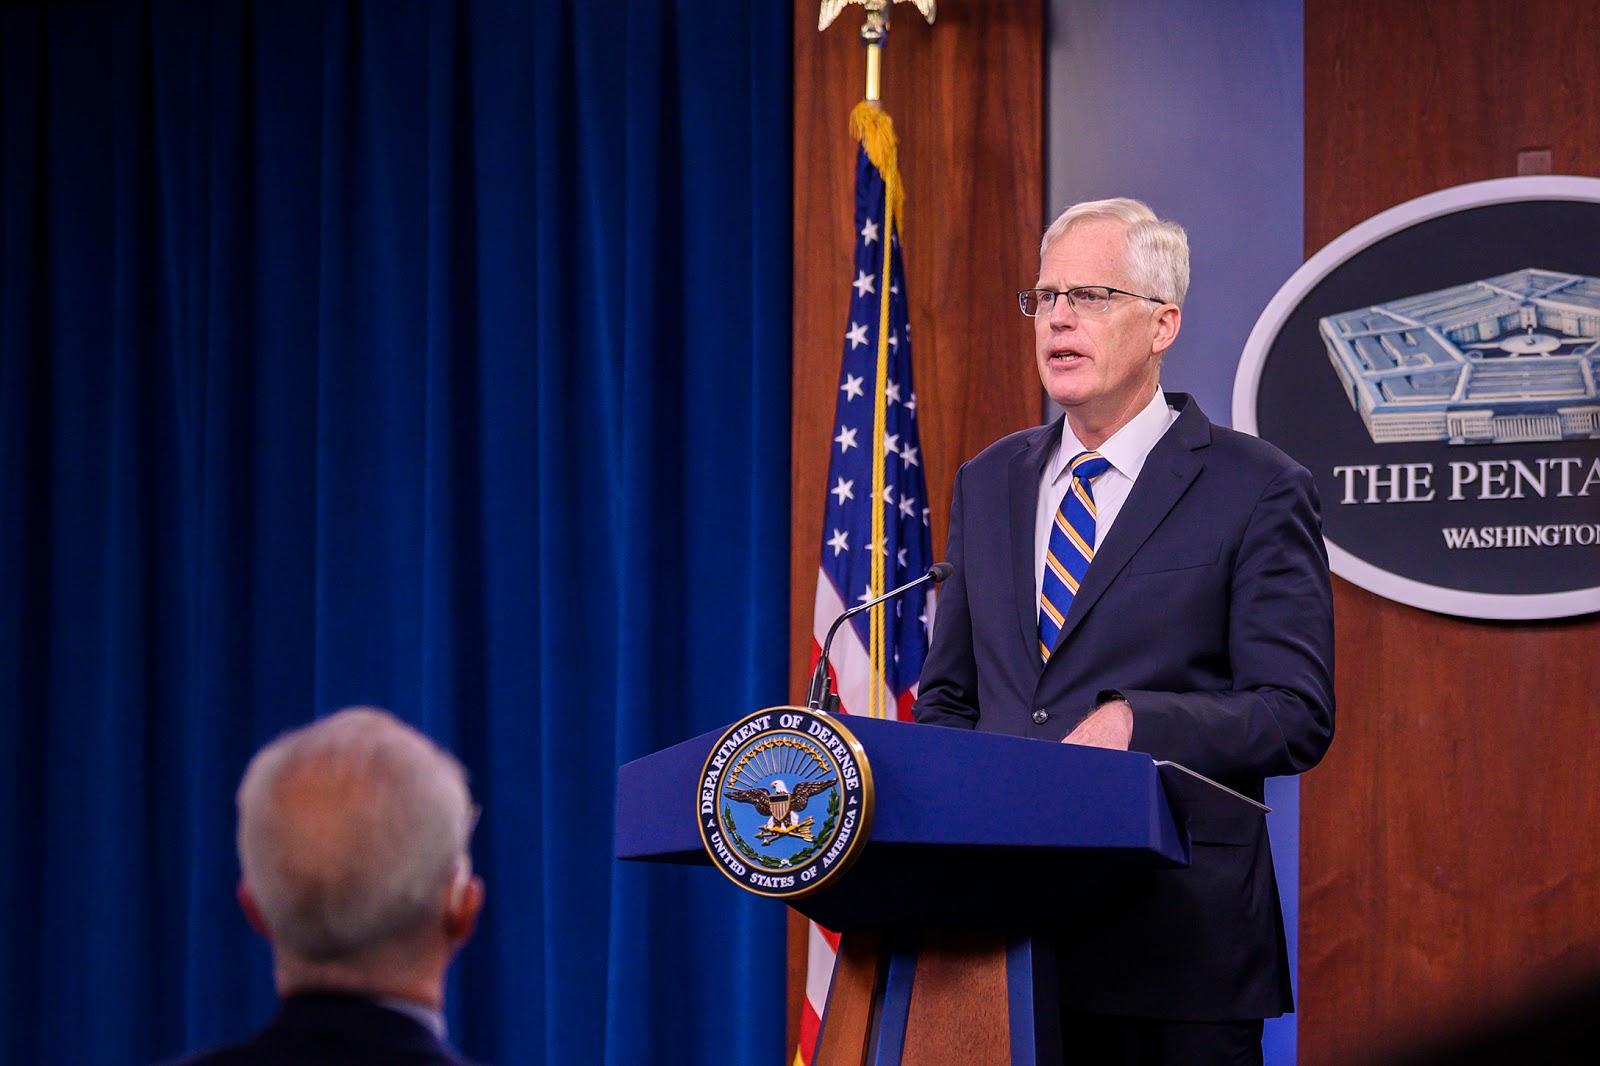 Acting Defense Secretary, Christopher Miller